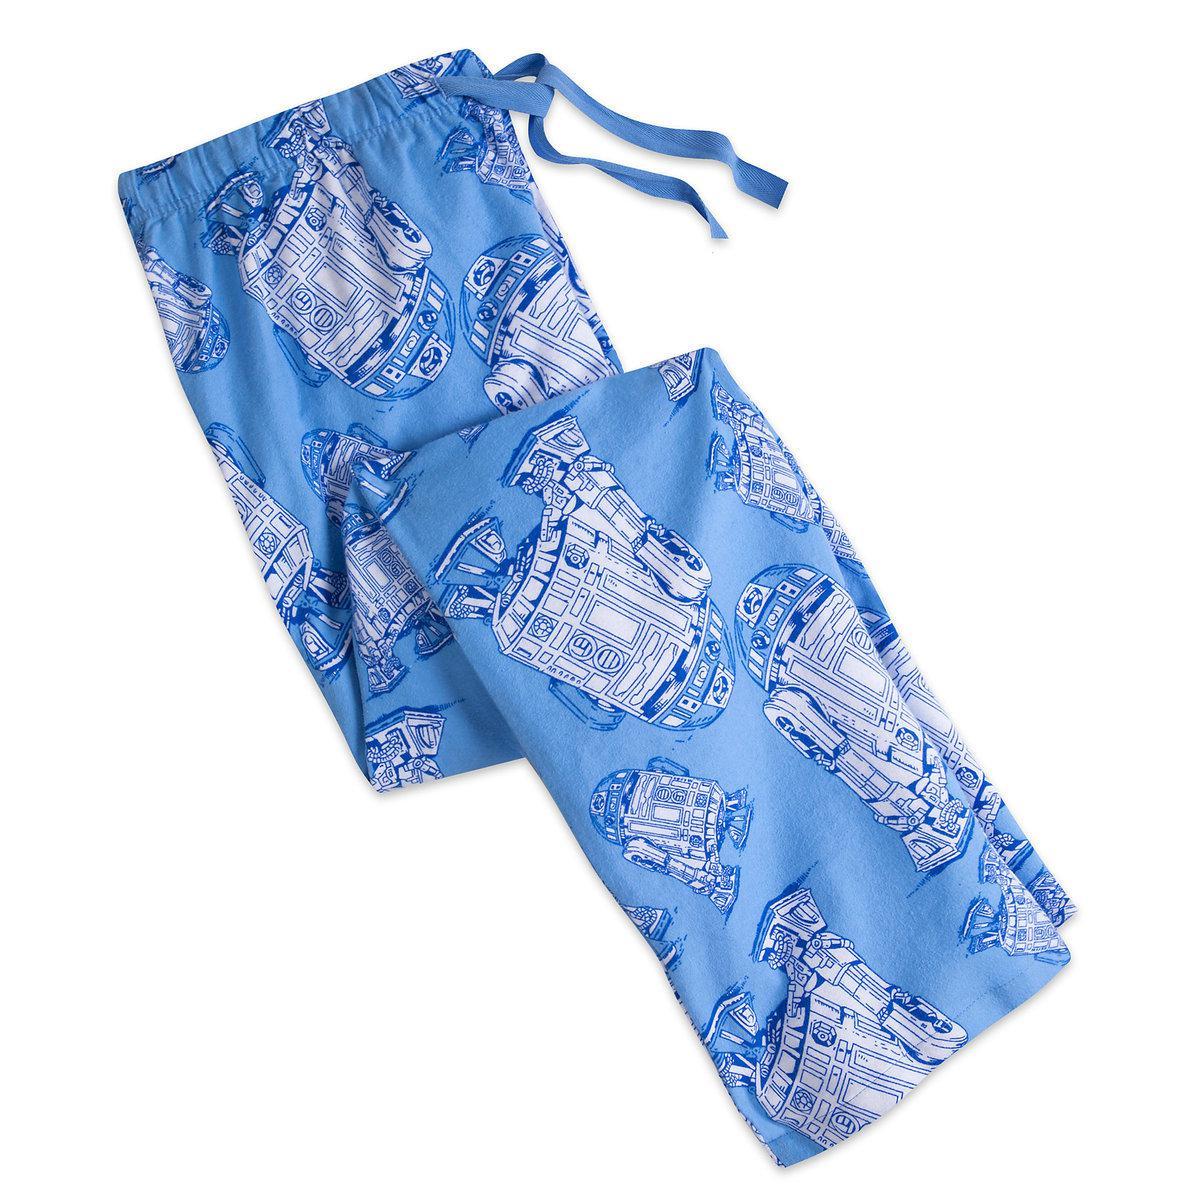 Пижамные штаны мужские L 52 Дисней / PJ for Men Disney R2-D2 Star Wars